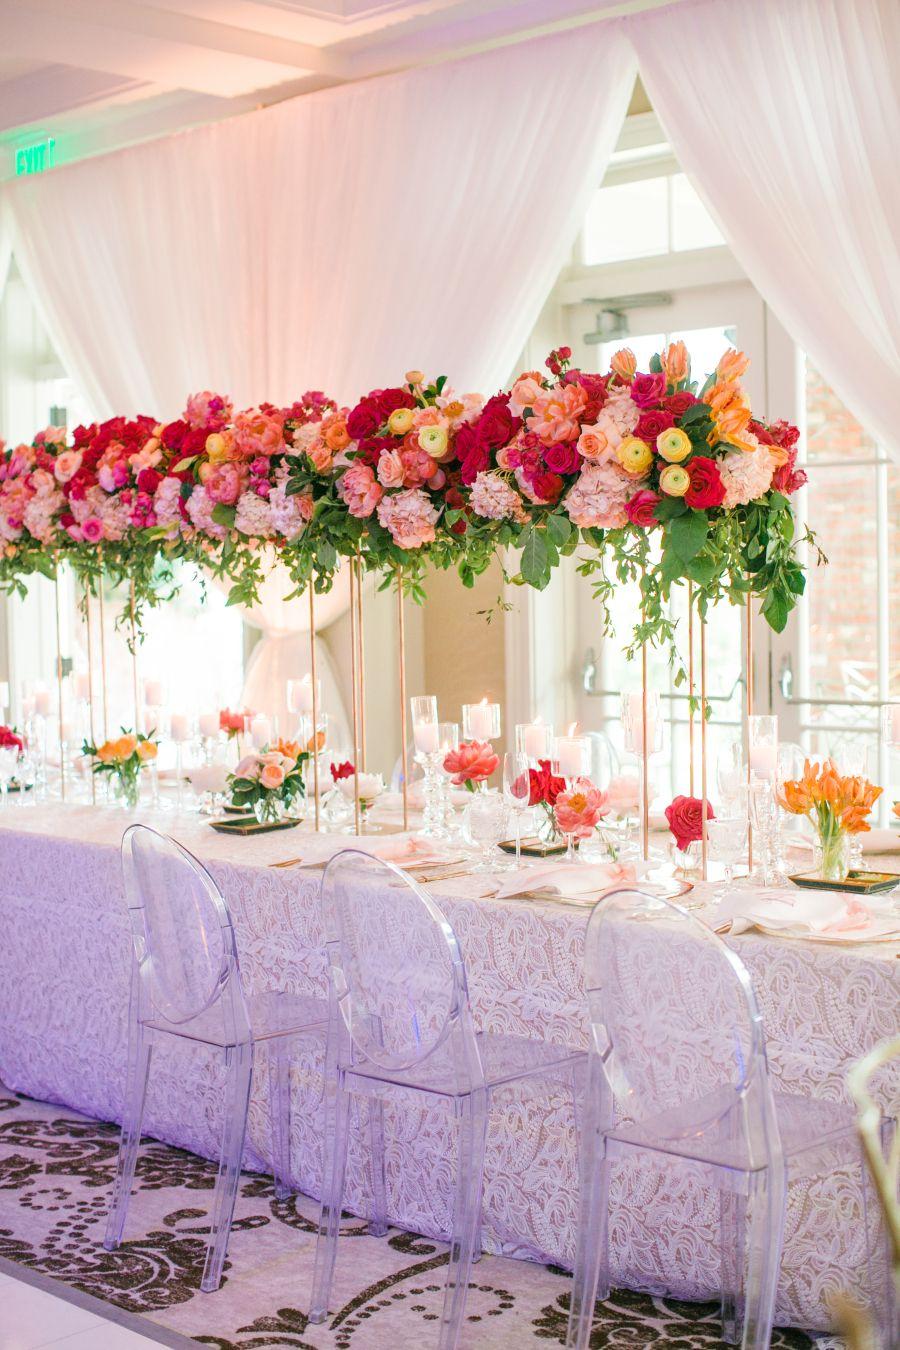 Bringing Bright Happy Hues To A Modern Ballroom Affair Wedding Floral Centerpieces Wedding Centerpieces Pink Wedding Centerpieces